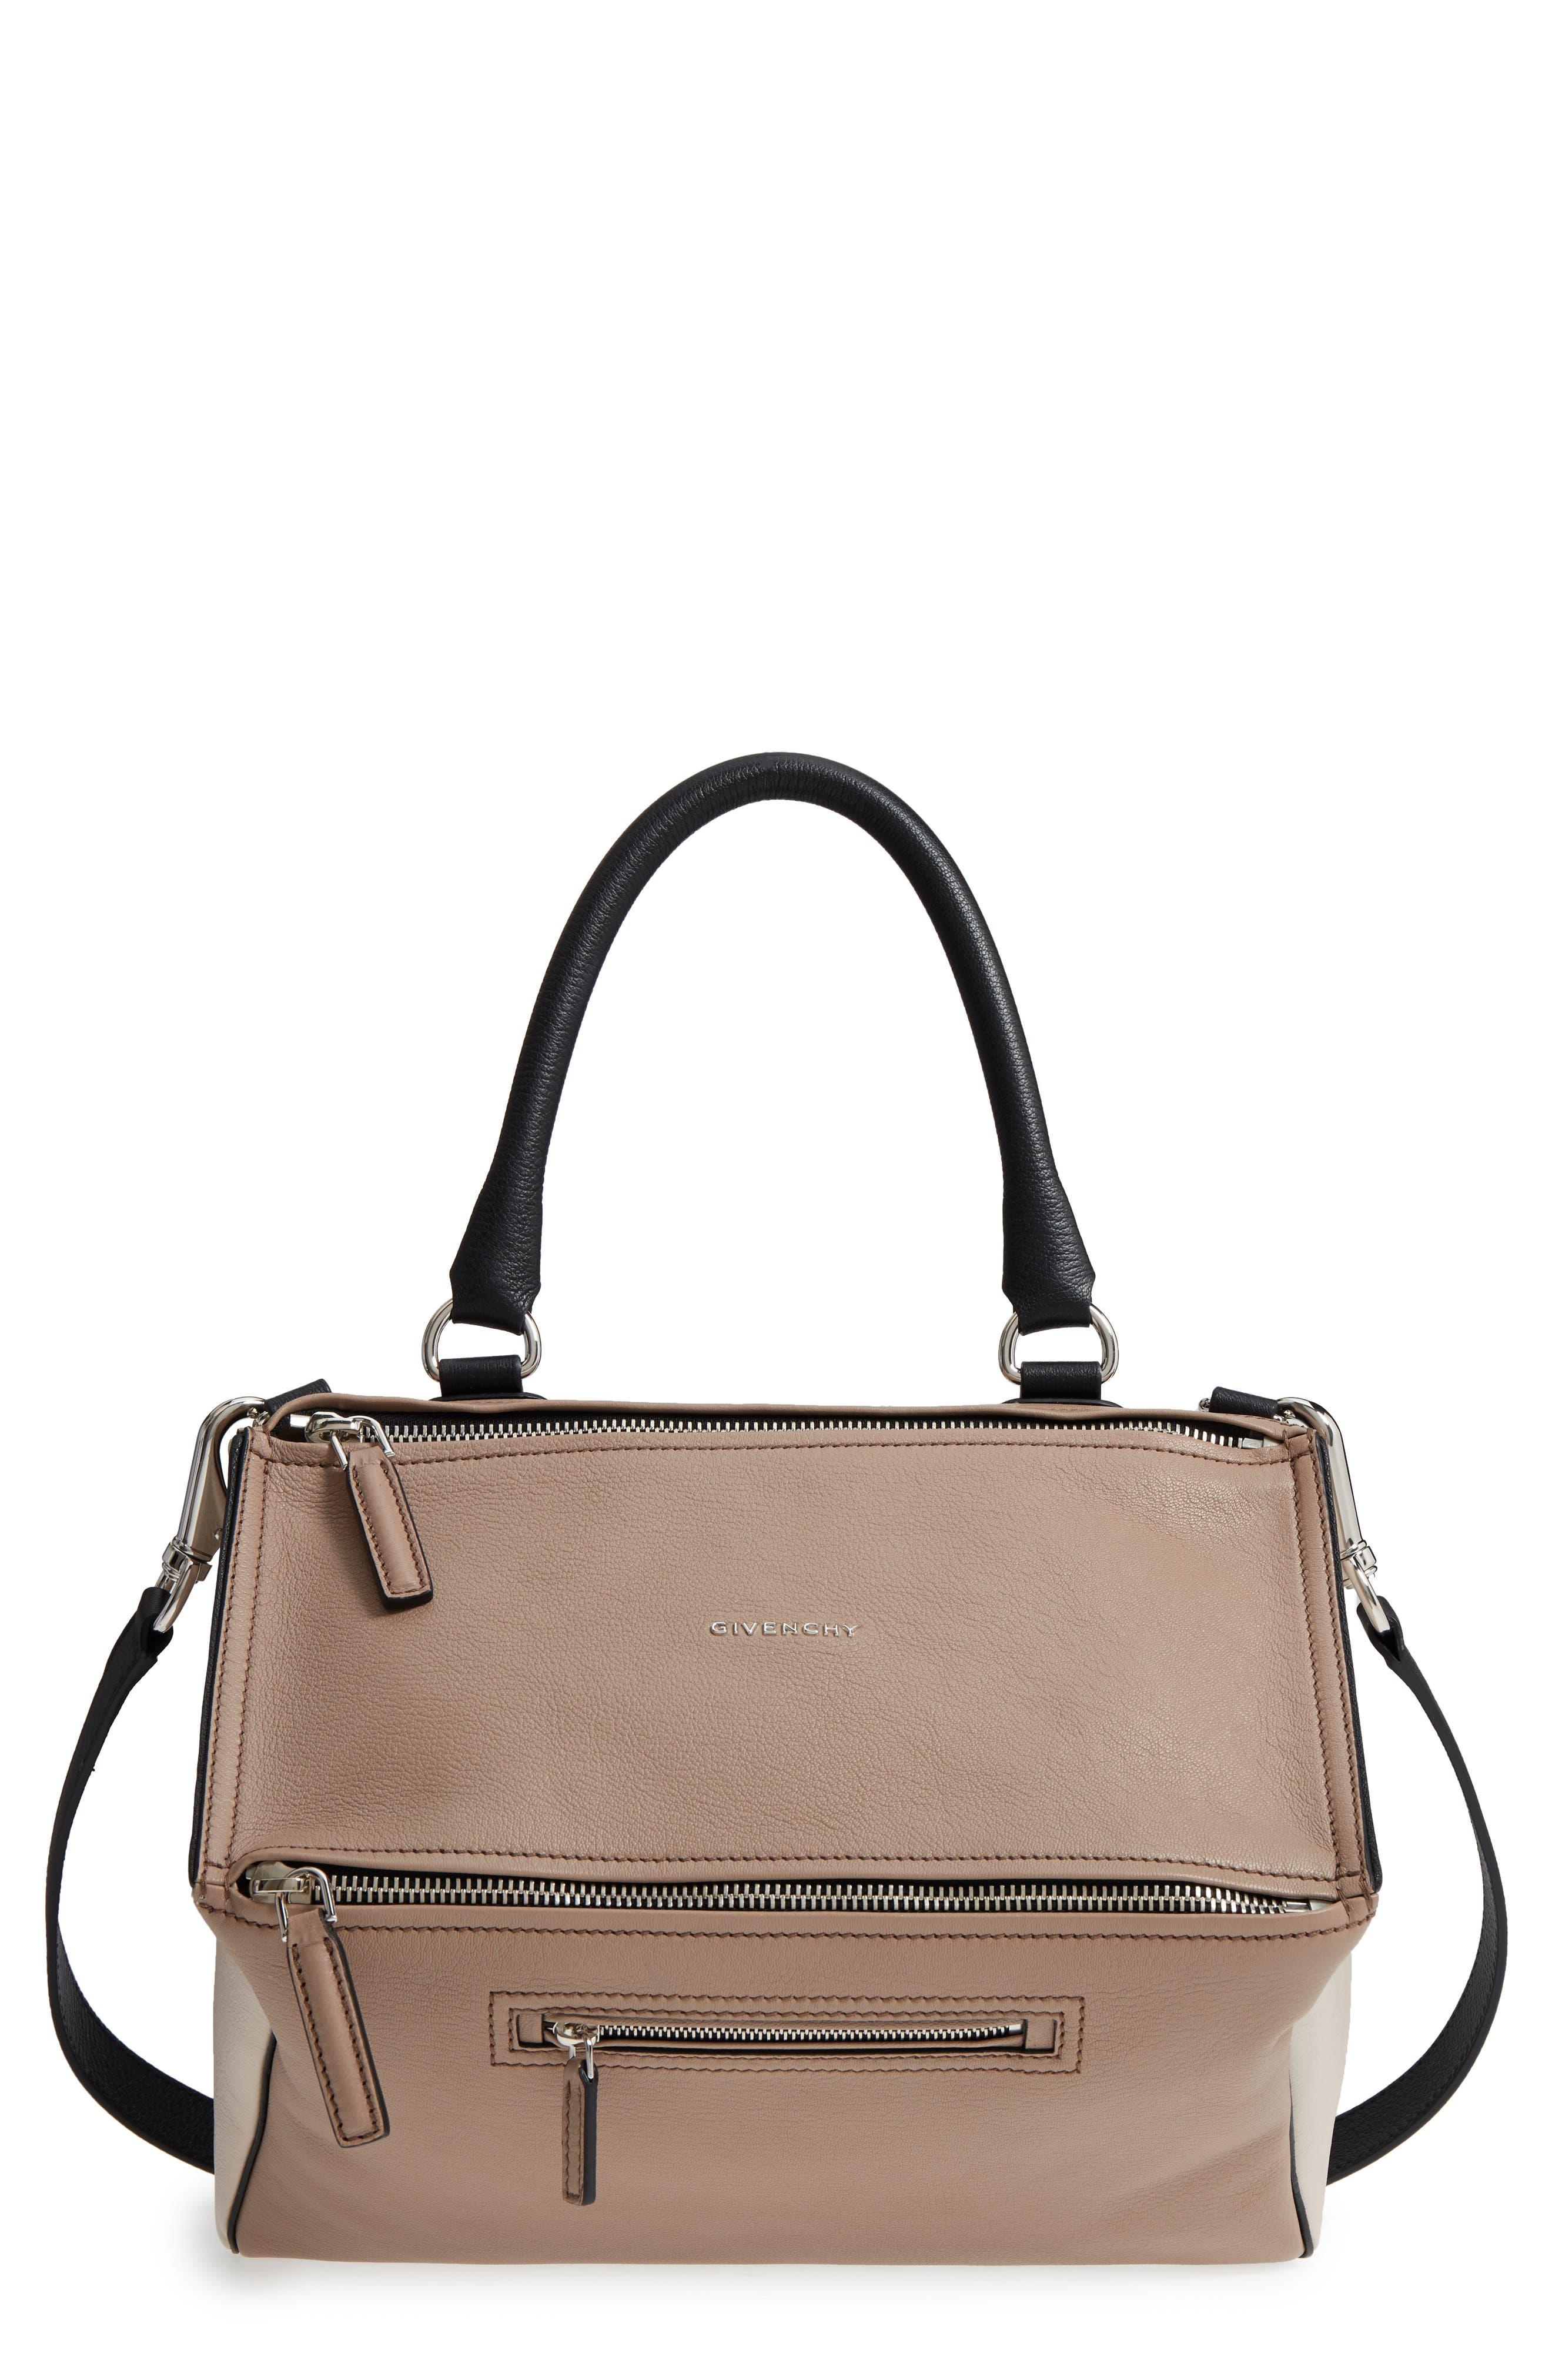 Medium Pandora Box Tricolor Leather Crossbody Bag,                             Main thumbnail 1, color,                             Linen